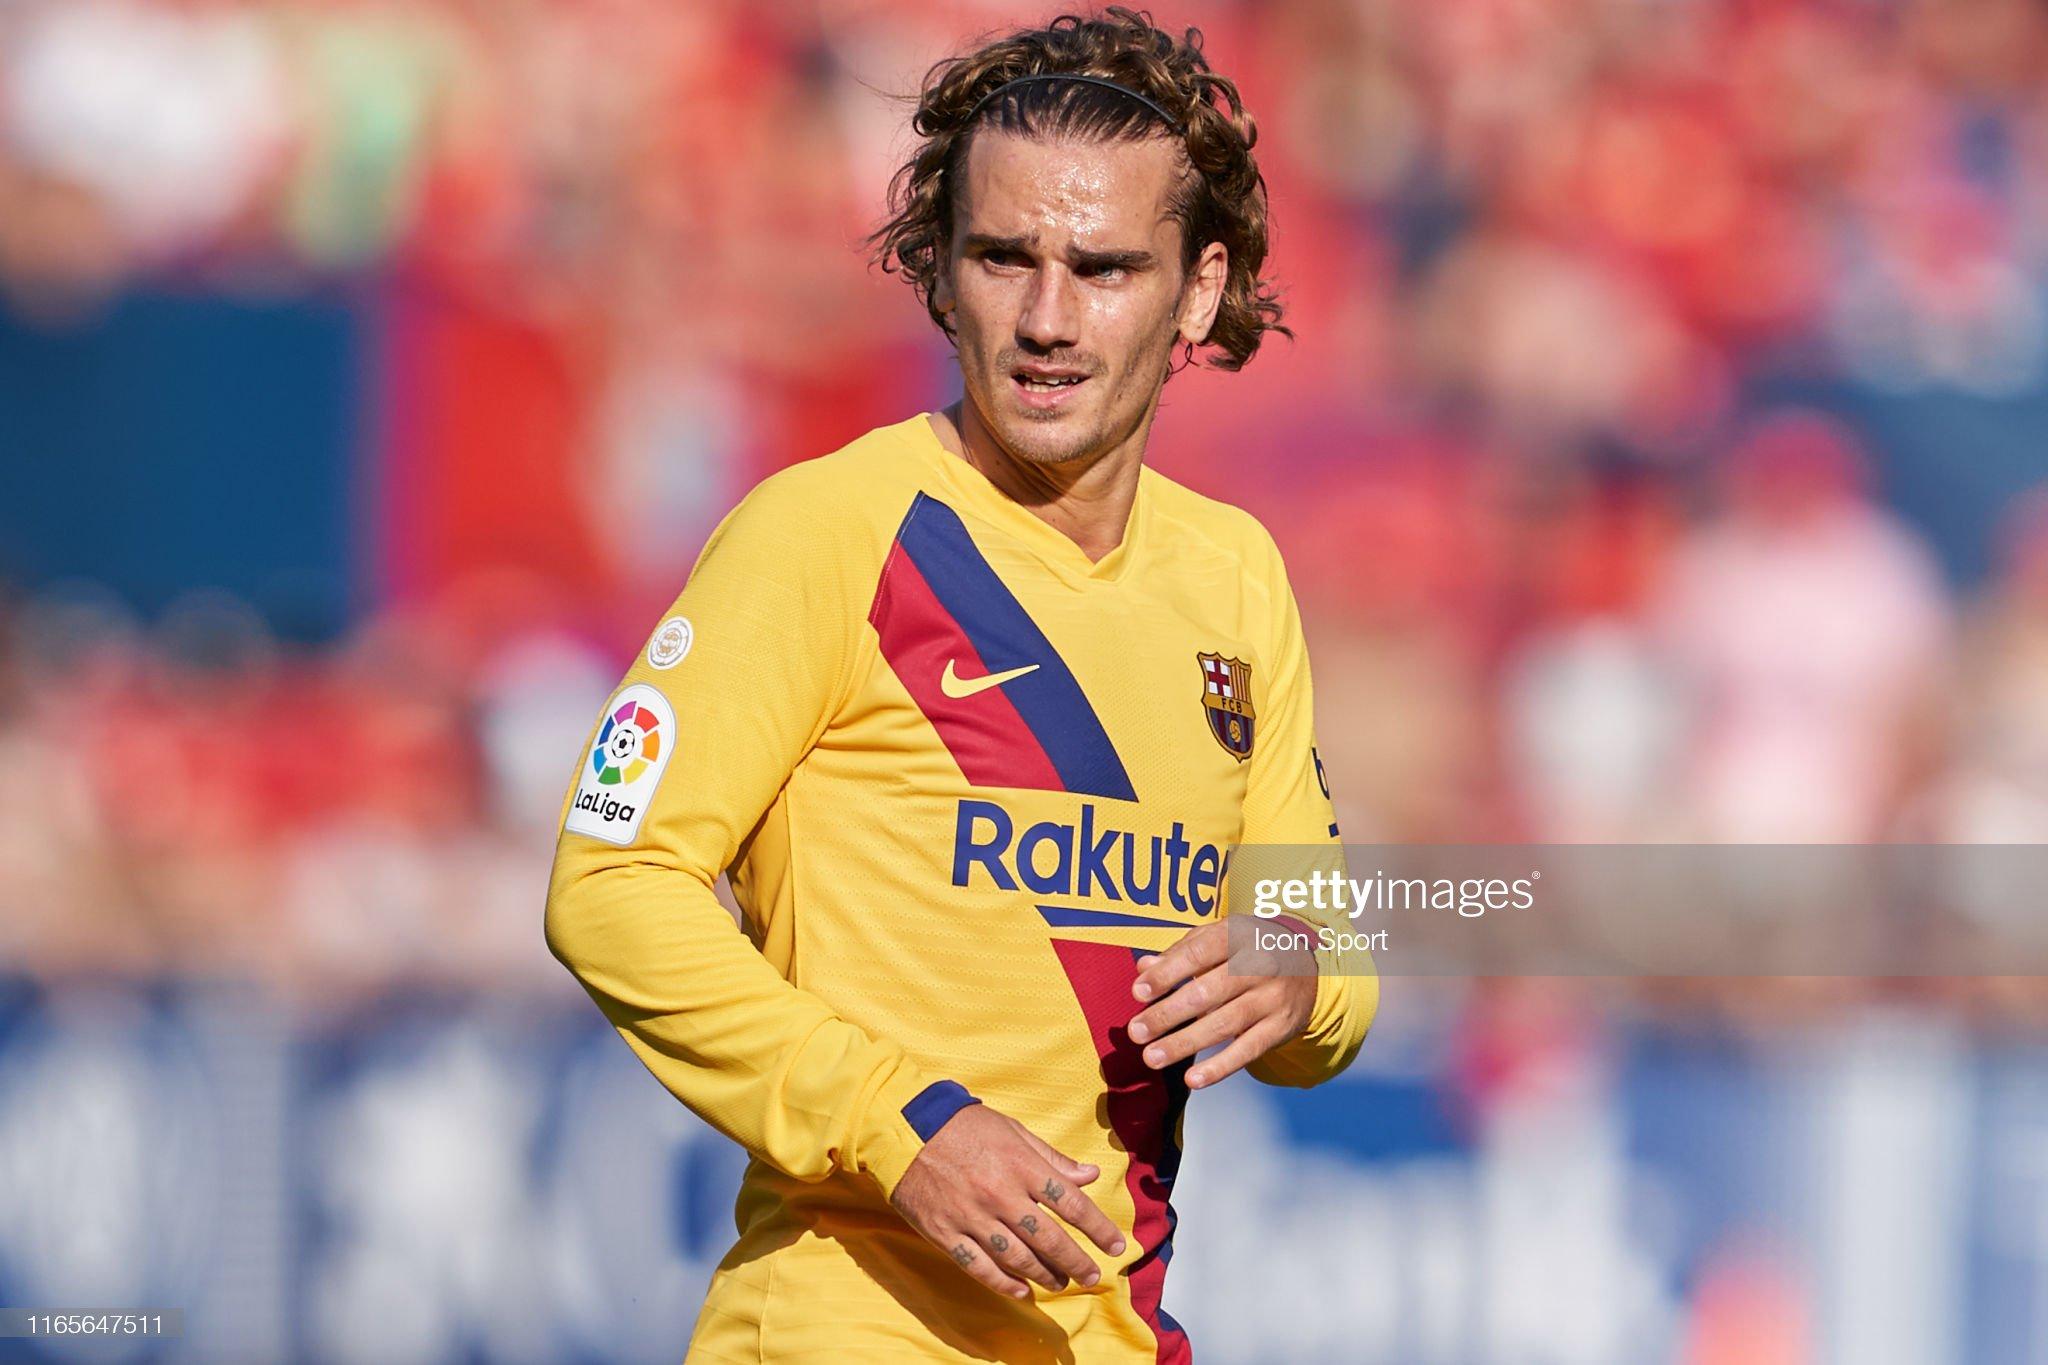 صور مباراة : أوساسونا - برشلونة 2-2 ( 31-08-2019 )  Antoine-griezmann-of-fc-barcelona-during-the-liga-match-between-and-picture-id1165647511?s=2048x2048